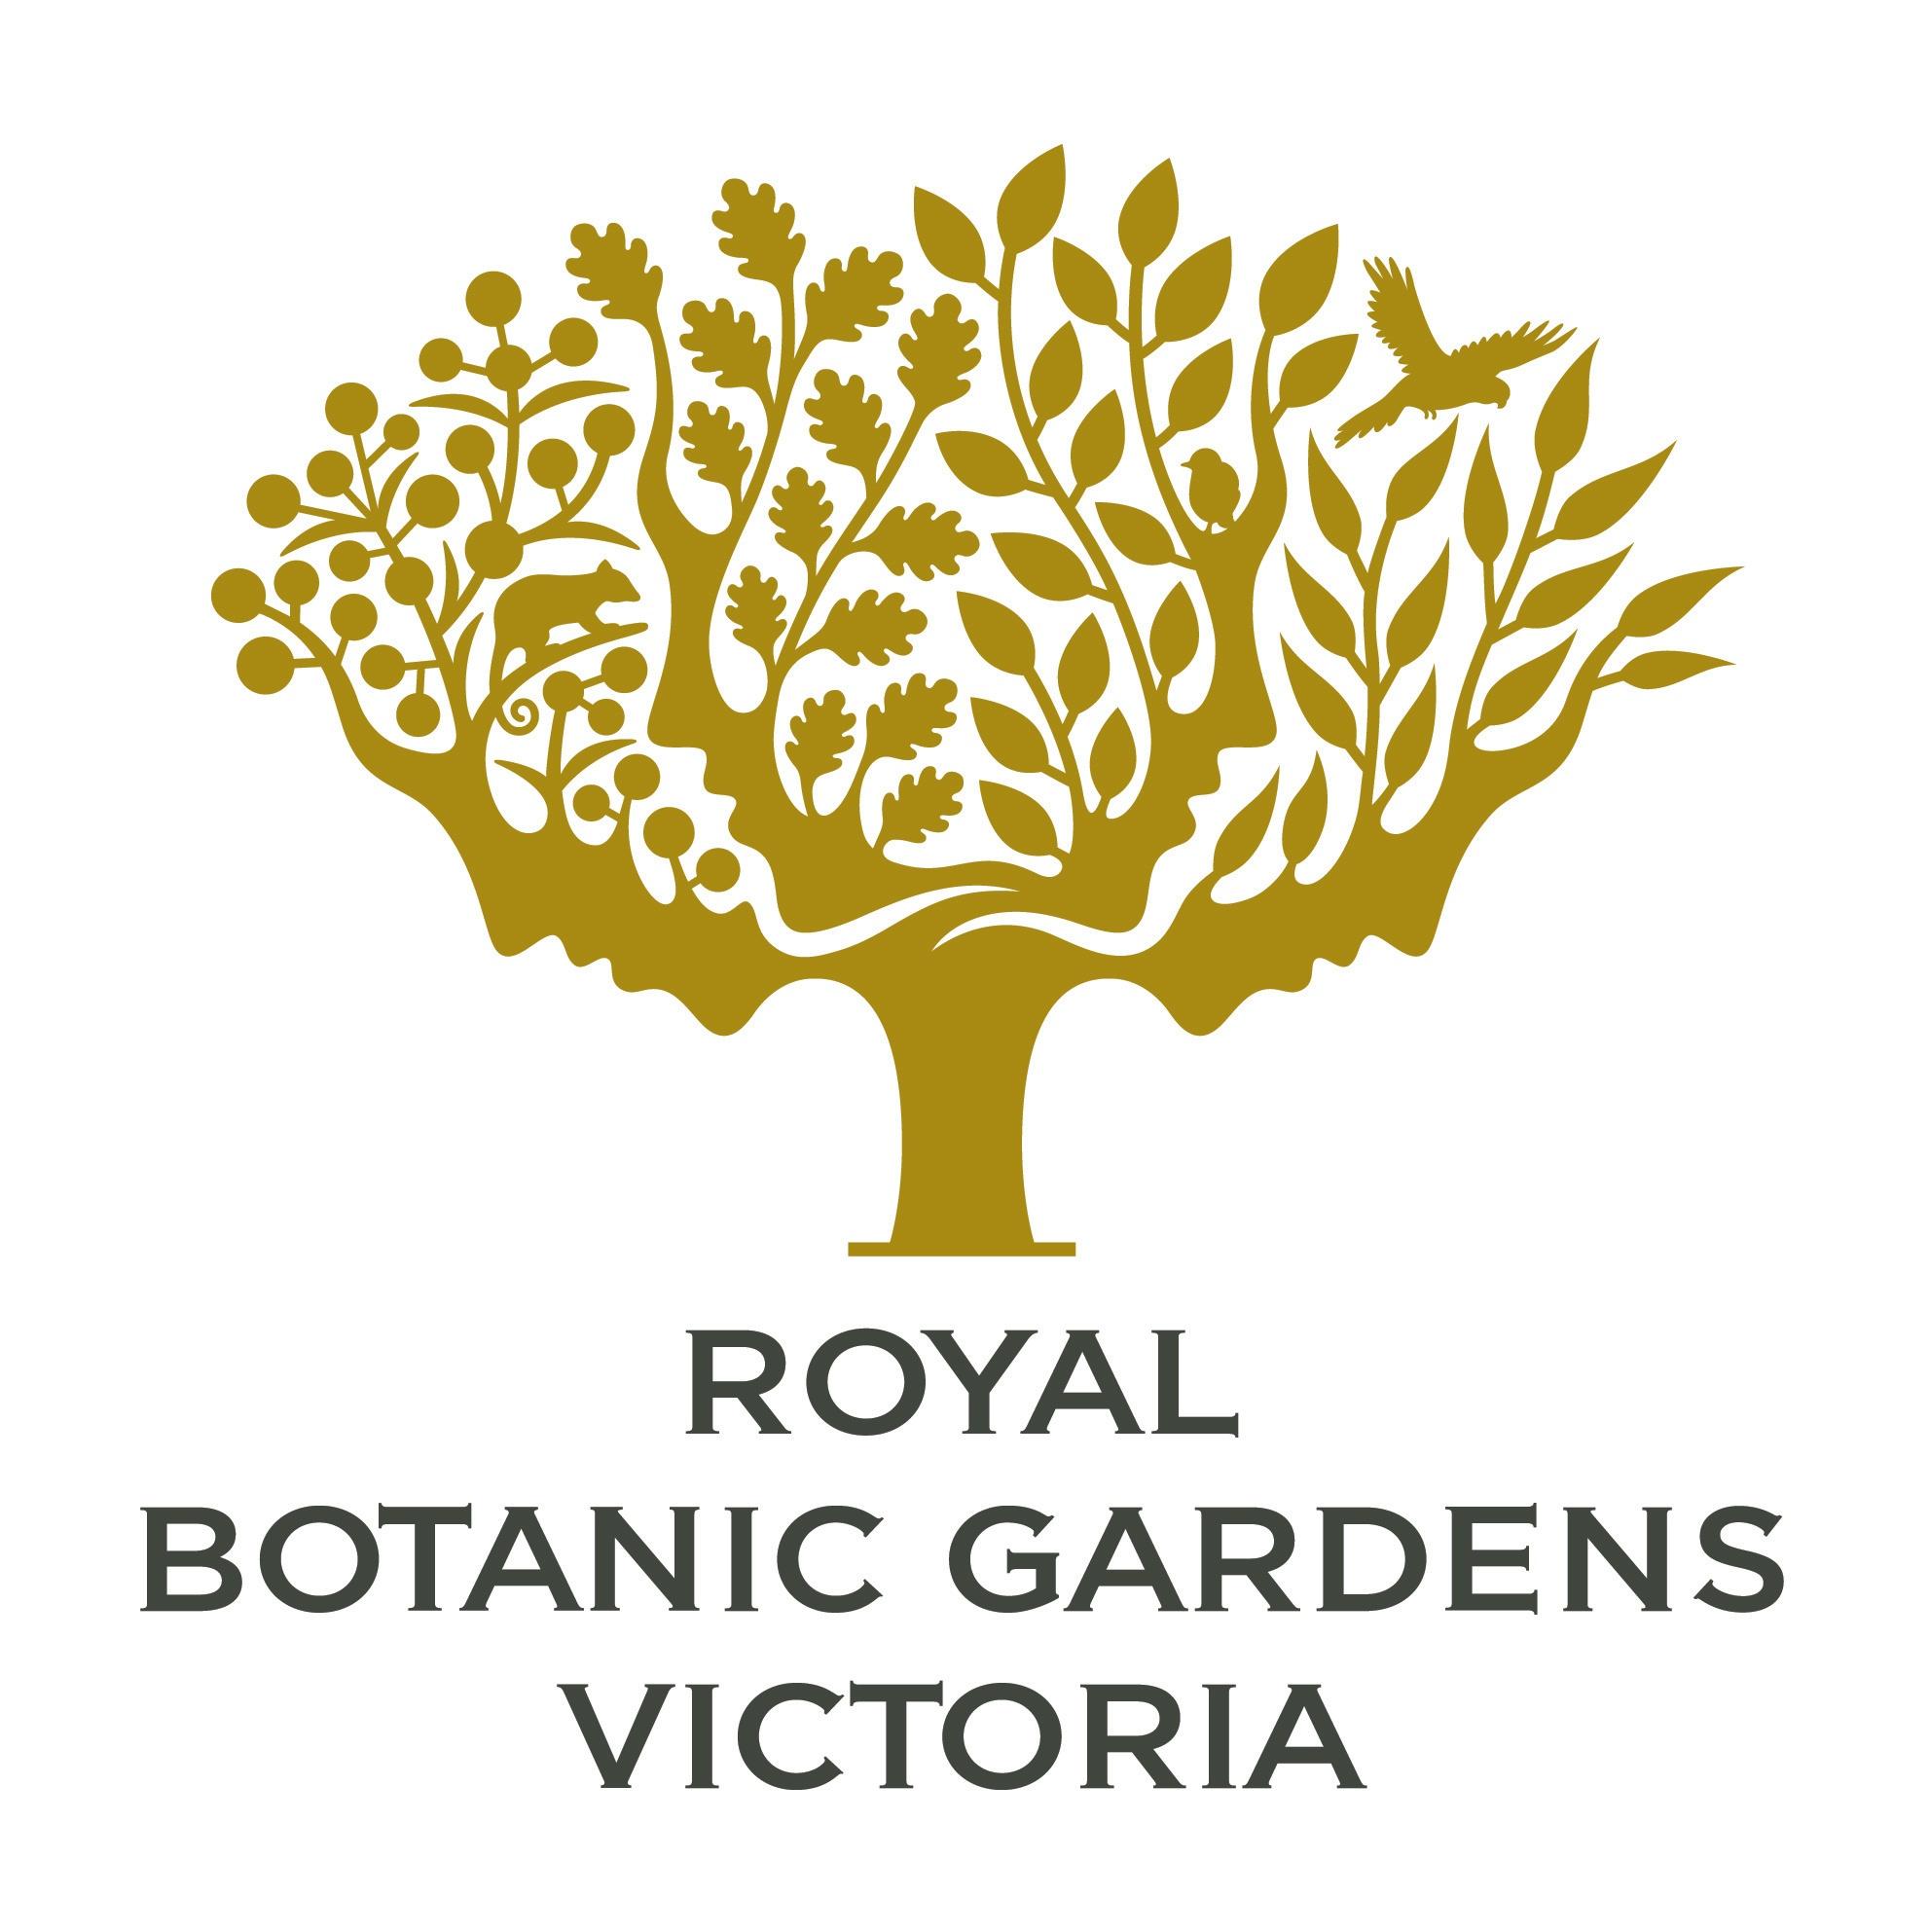 Royal Botanic Gardens Victoria logo